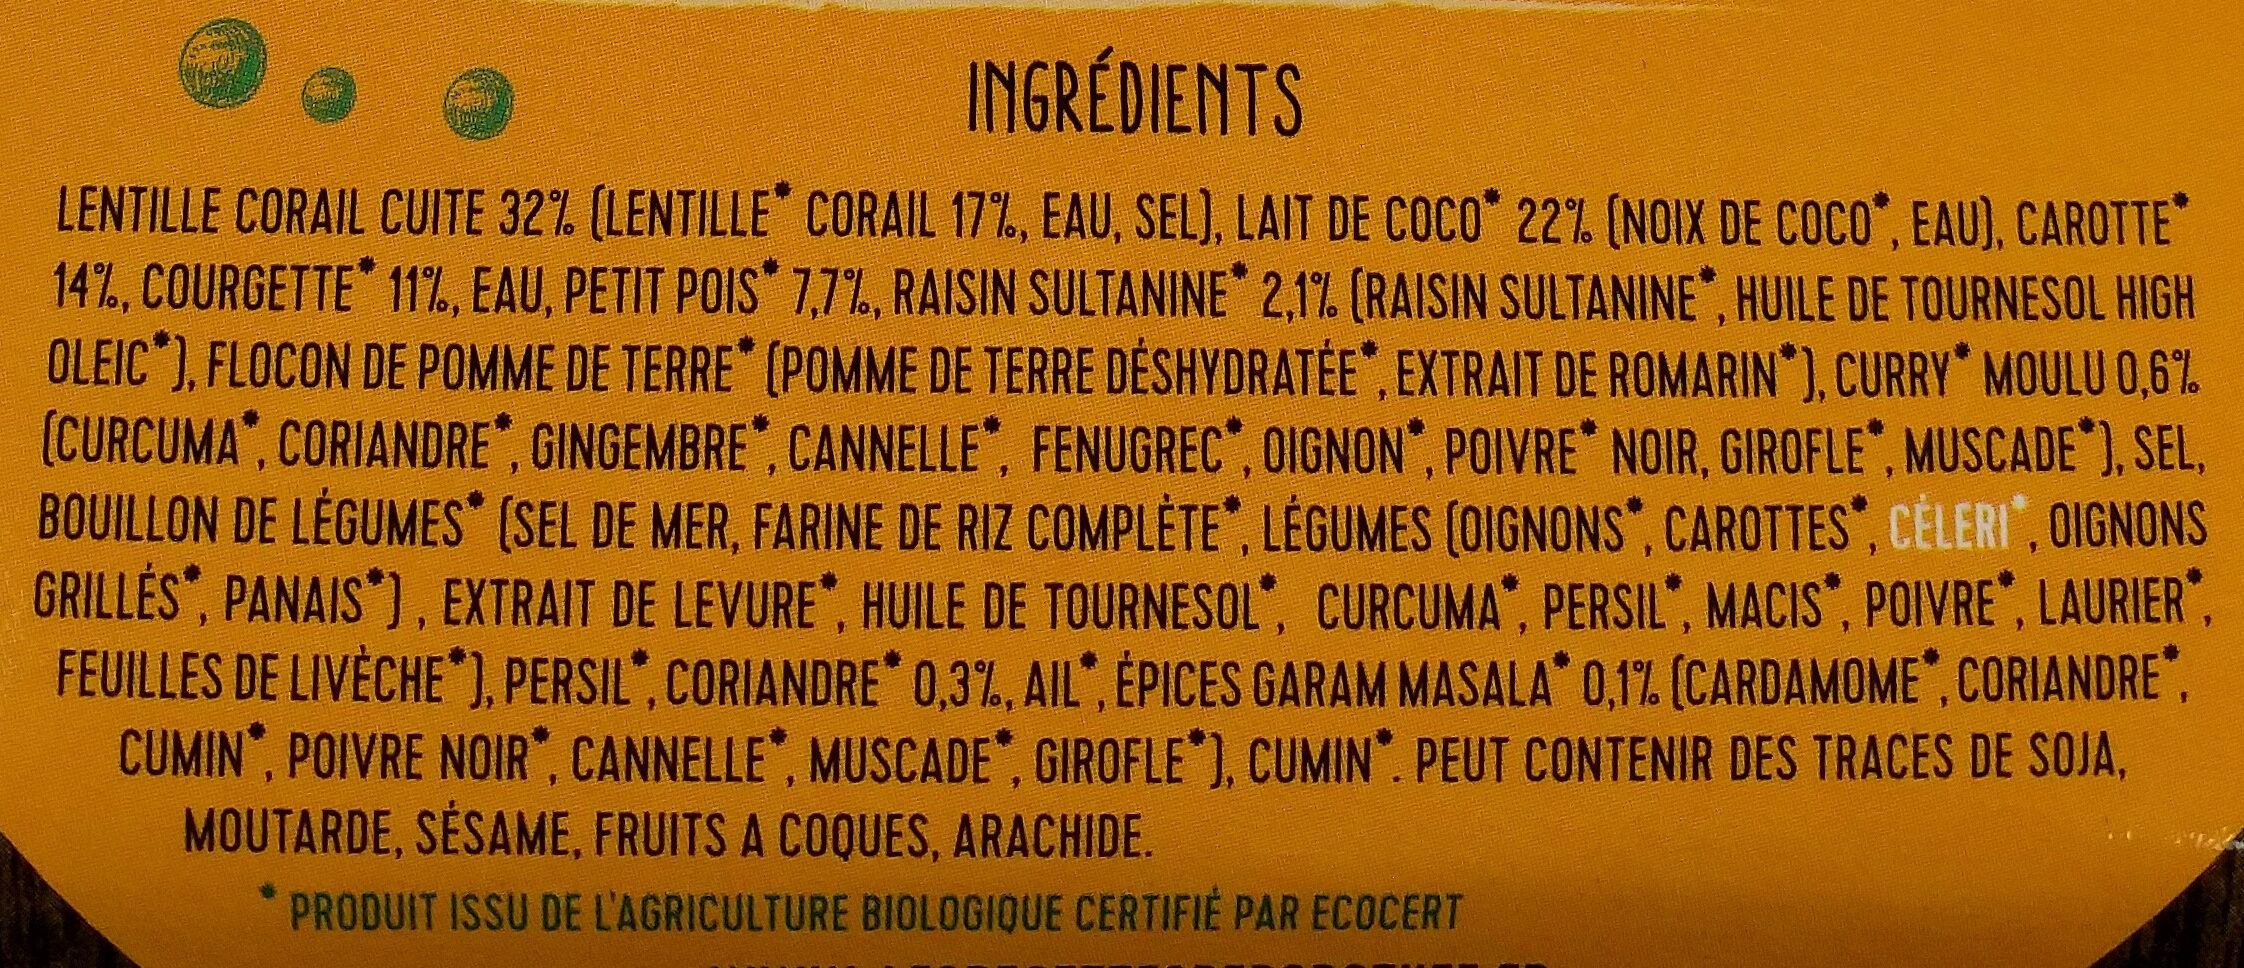 Dahl lait de coco - Ingrediënten